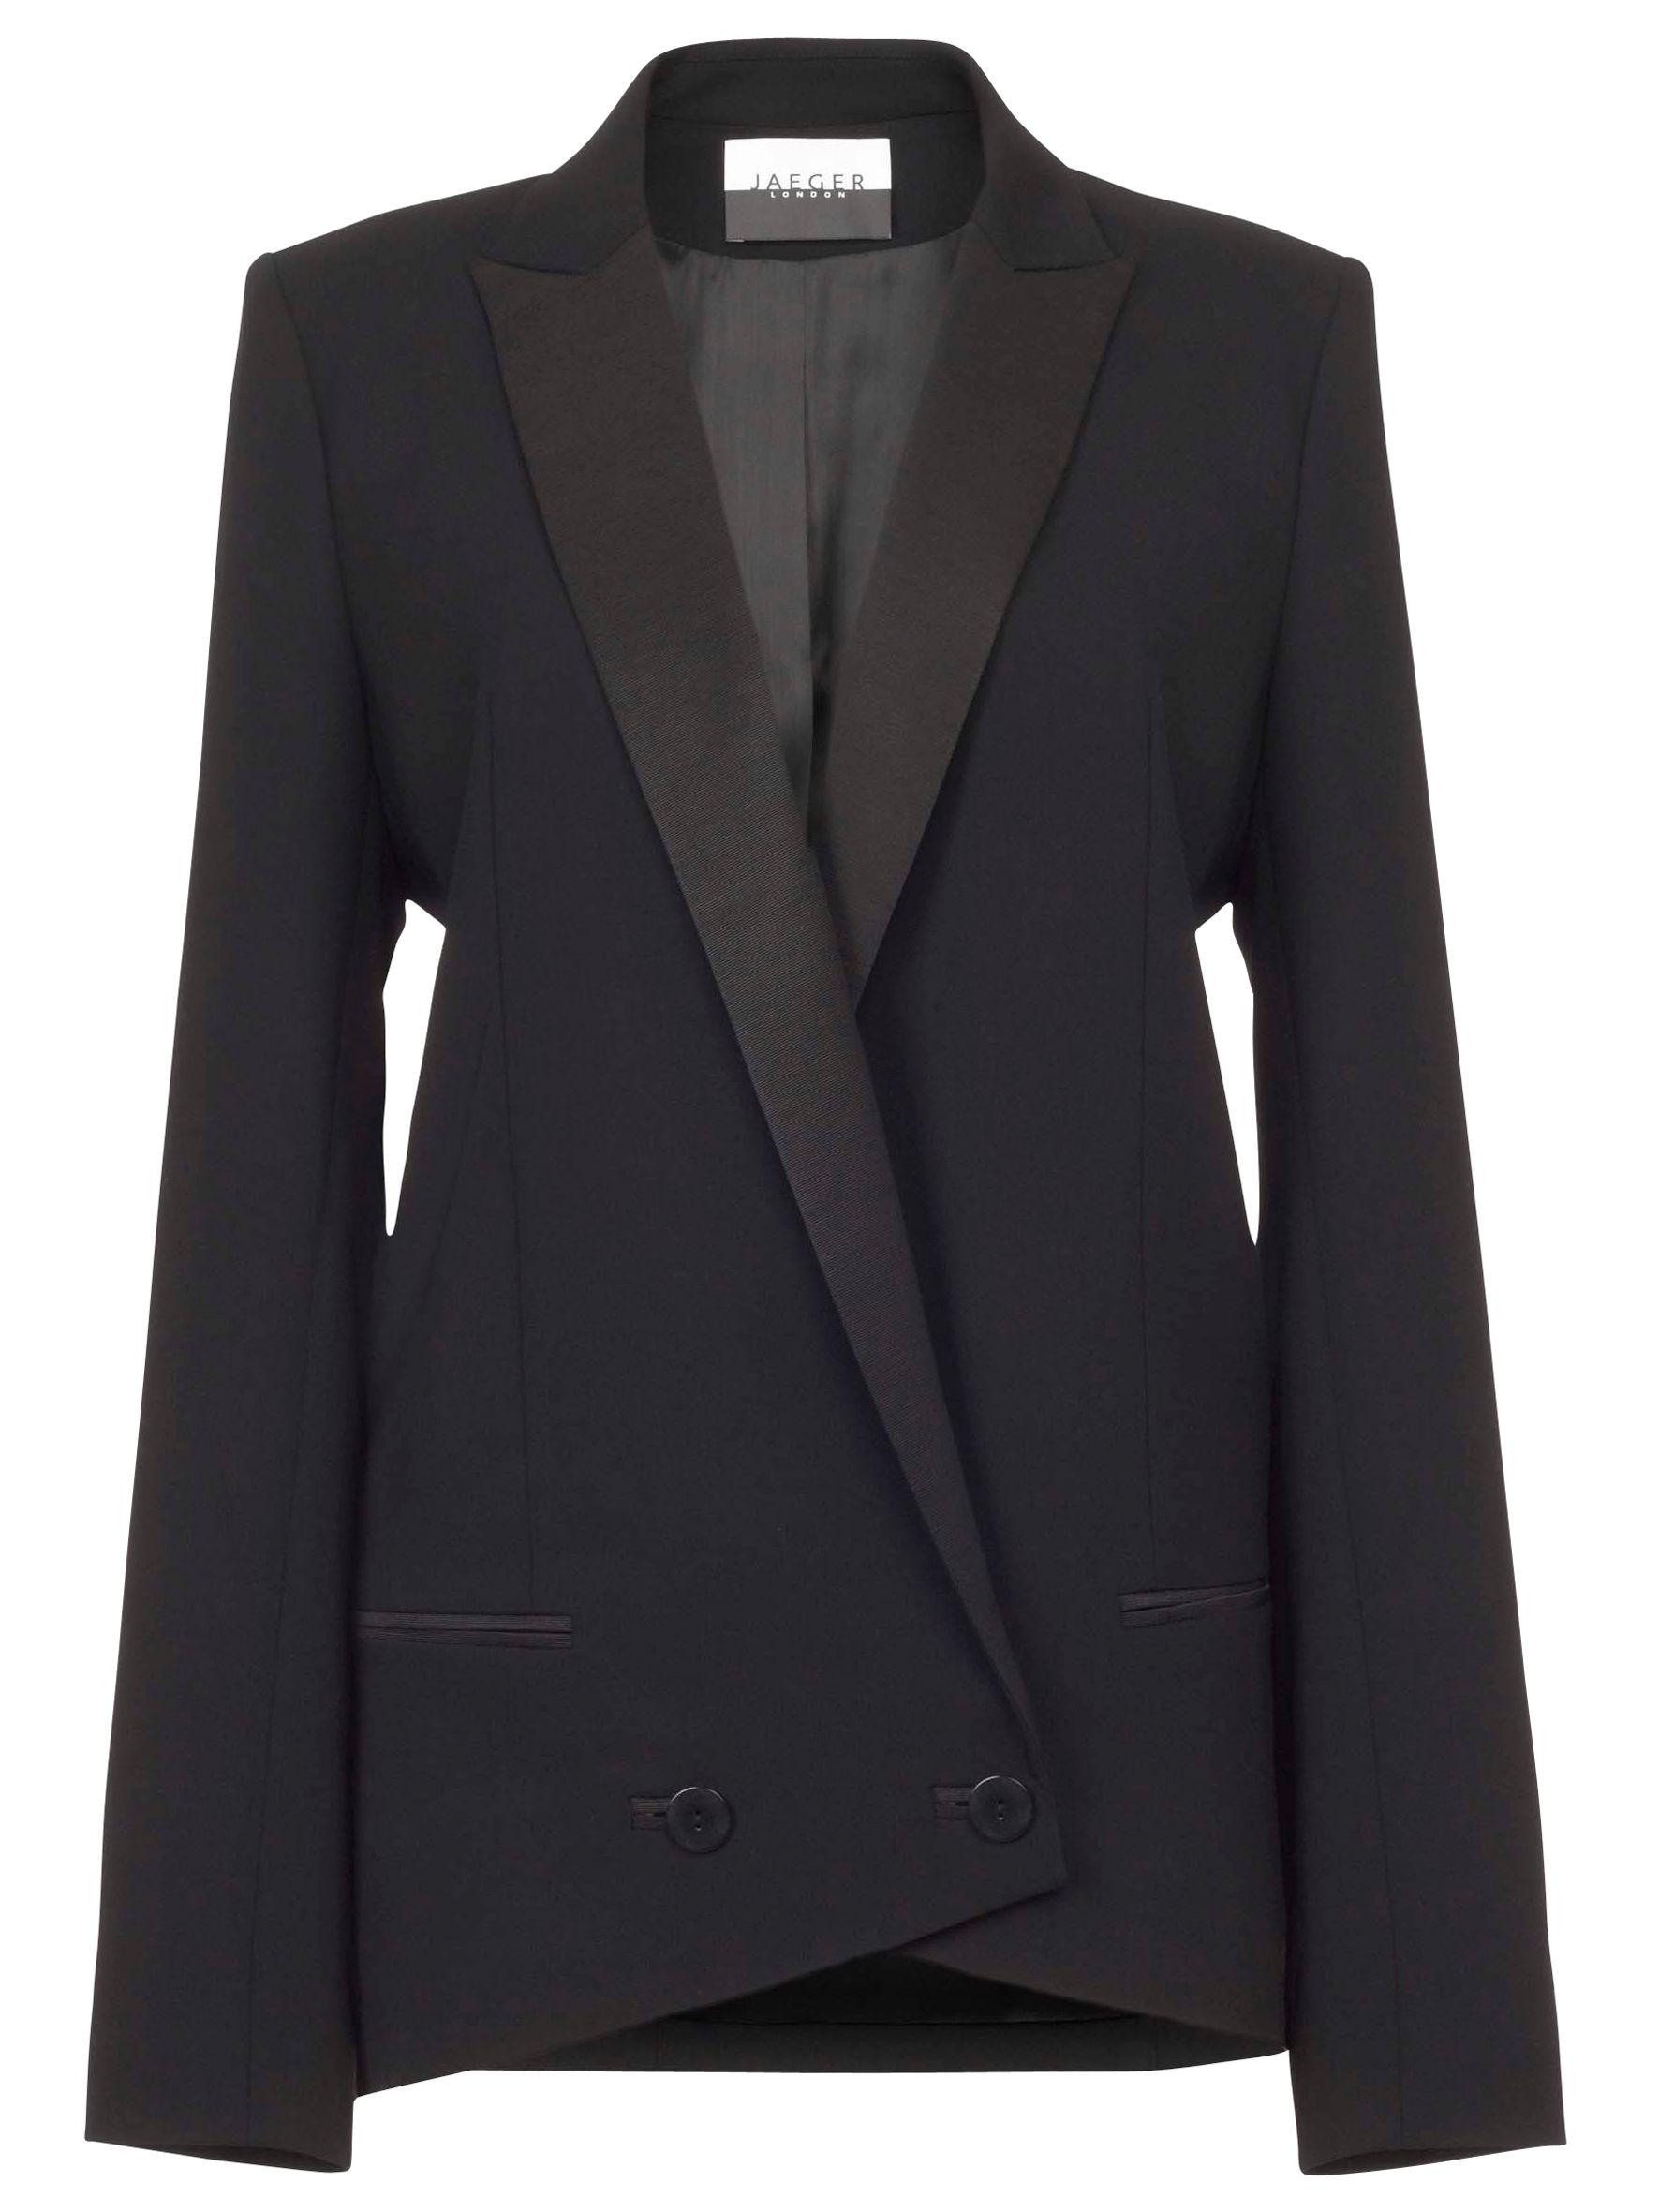 Jaeger Longline Tuxedo Jacket, Black at John Lewis